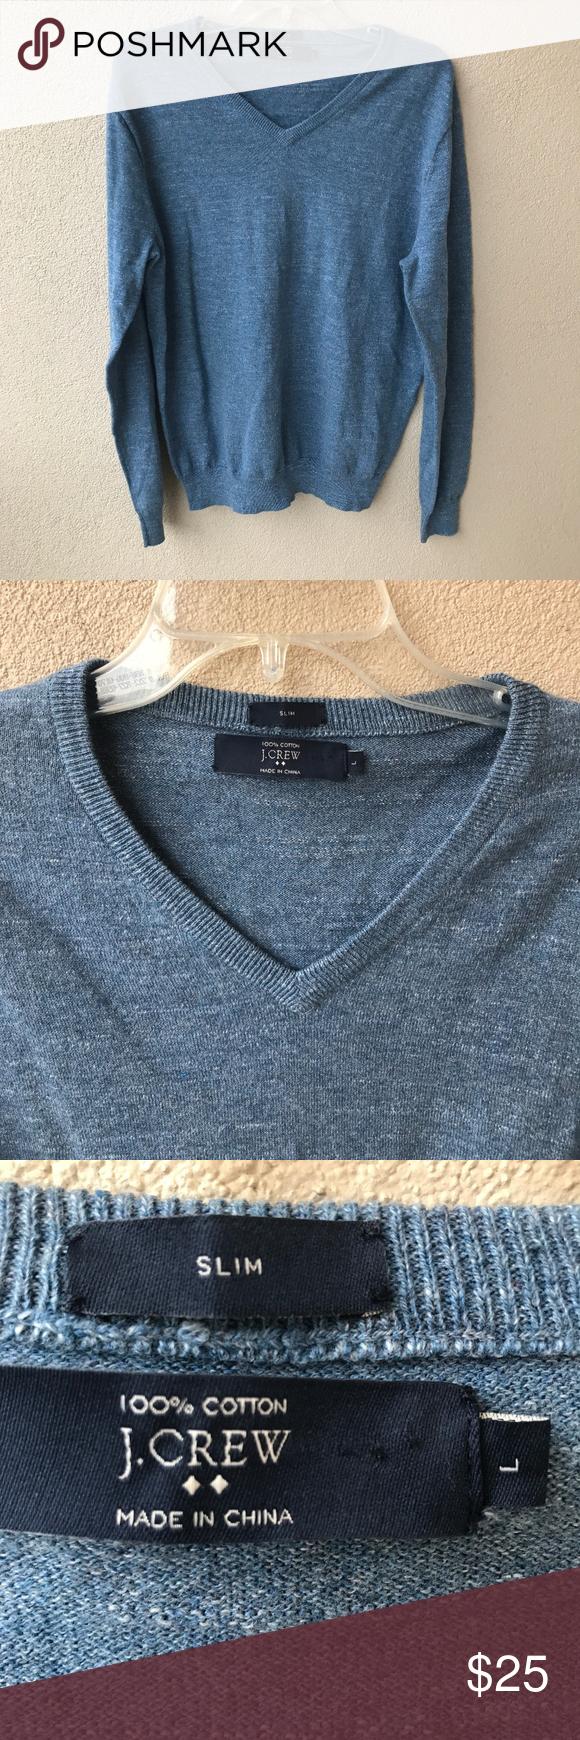 832a03638e8 J. Crew Factory Slim Textured V-Neck Sweater Blue textured cotton slim fit v